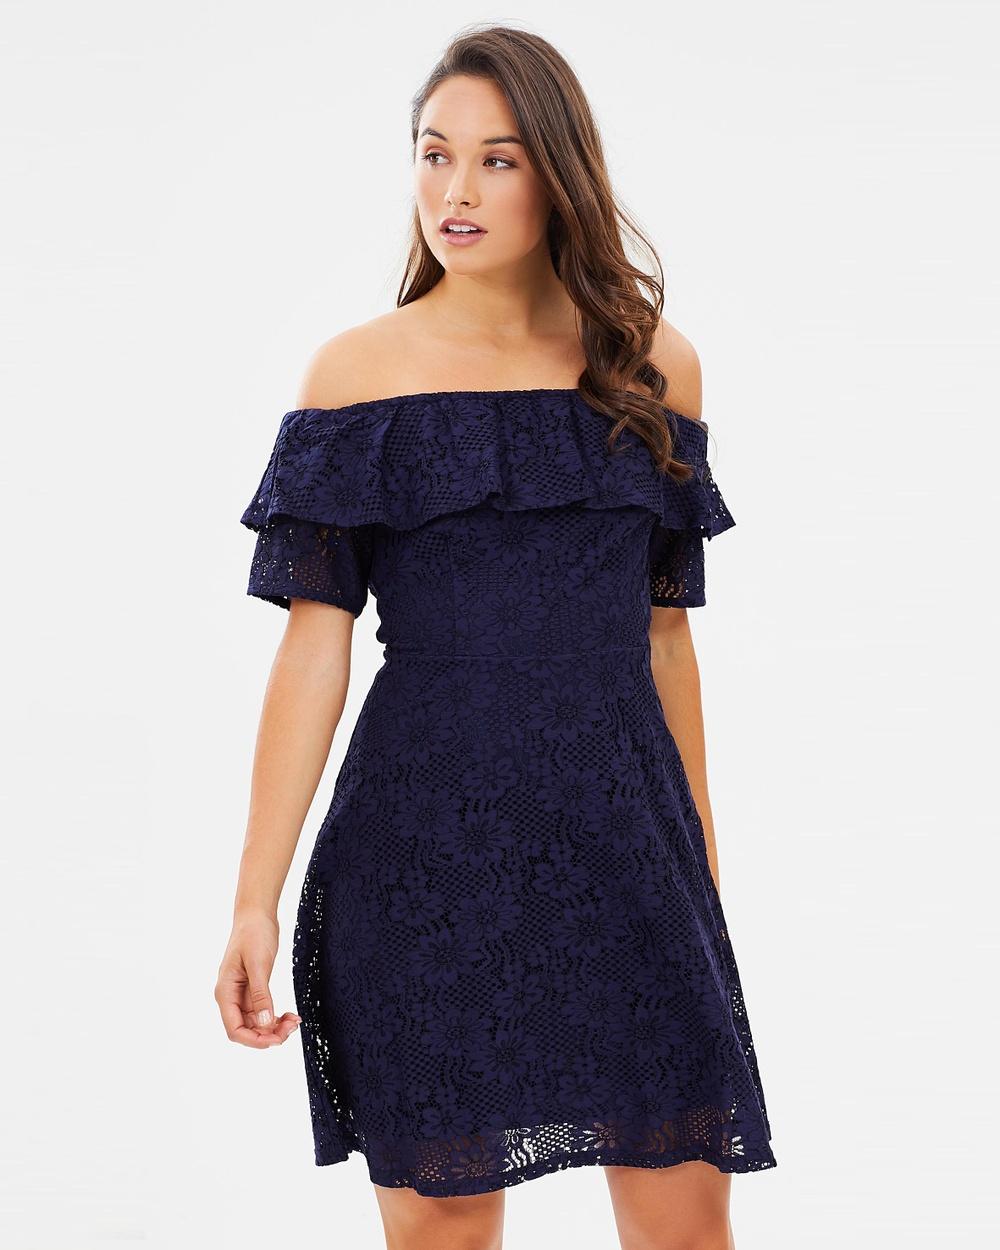 Dorothy Perkins Lace Bardot Pencil Dress Dresses Navy Blue Lace Bardot Pencil Dress